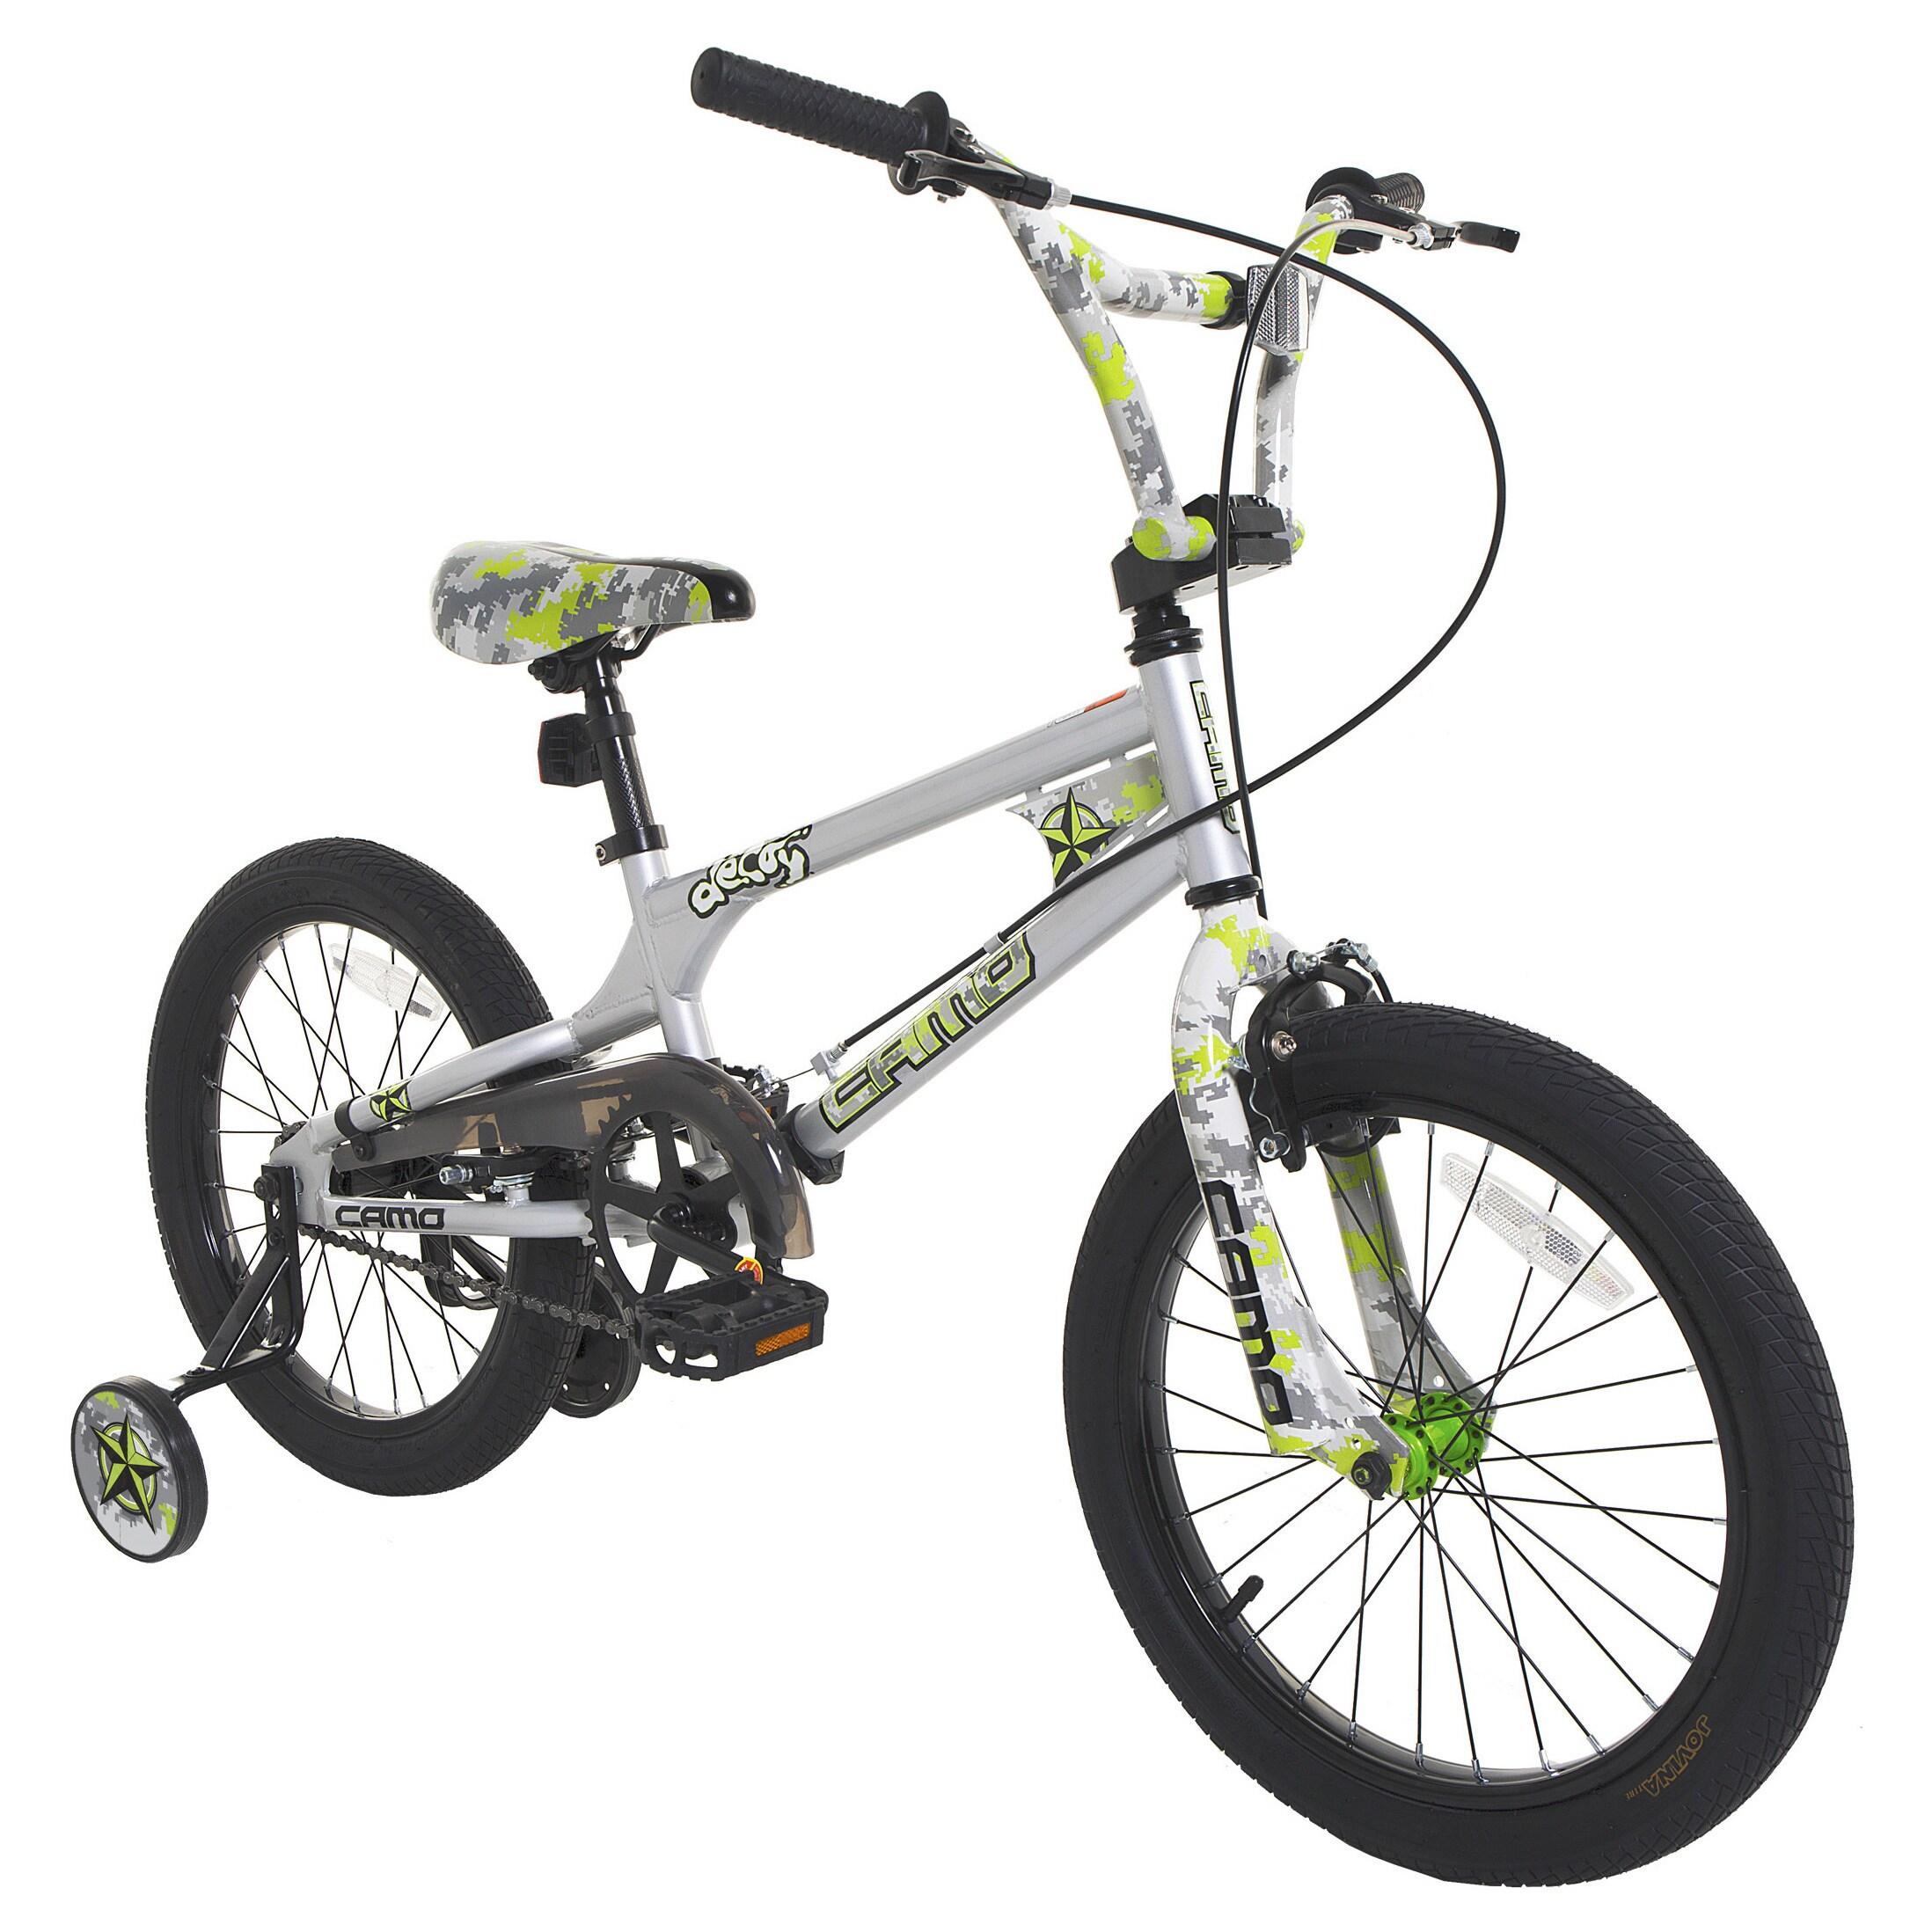 LTD Camo Decoy 18-inch Boys Bike (18'' Silver, Neon Green)